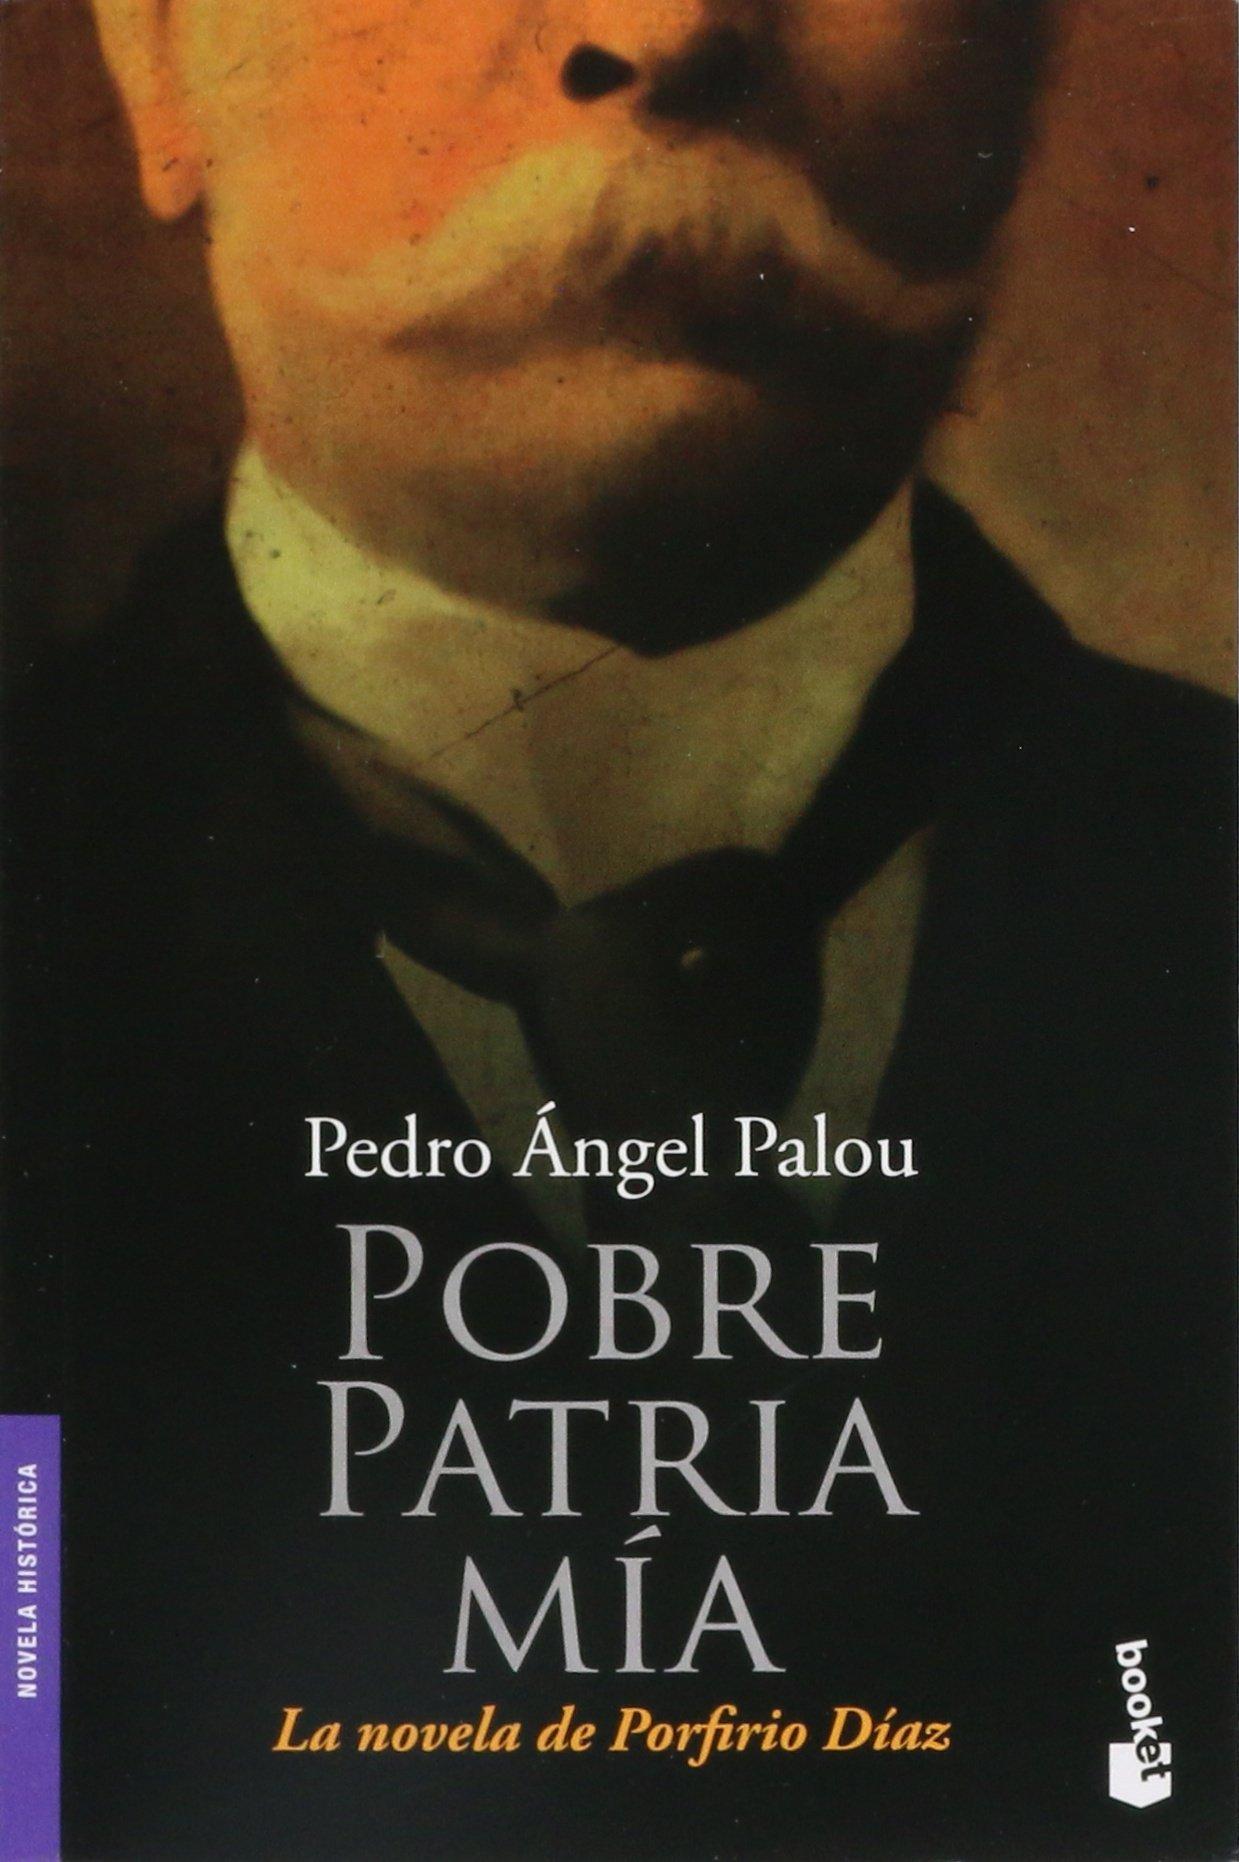 Download POBRE PATRIA MIA PDF